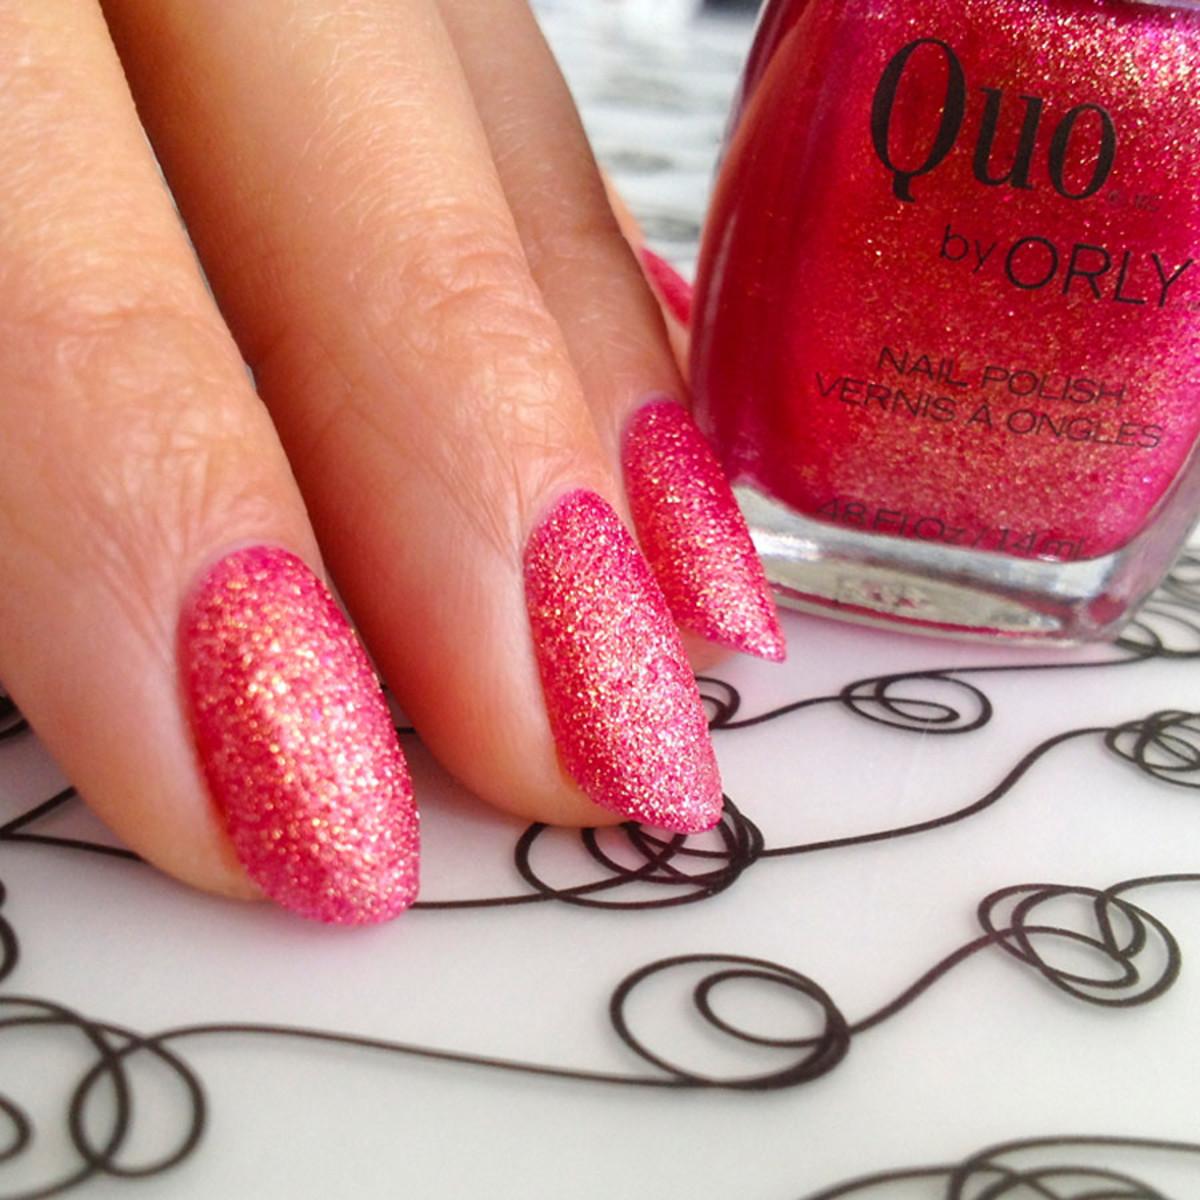 Quo by Orly Mega Fuchsia